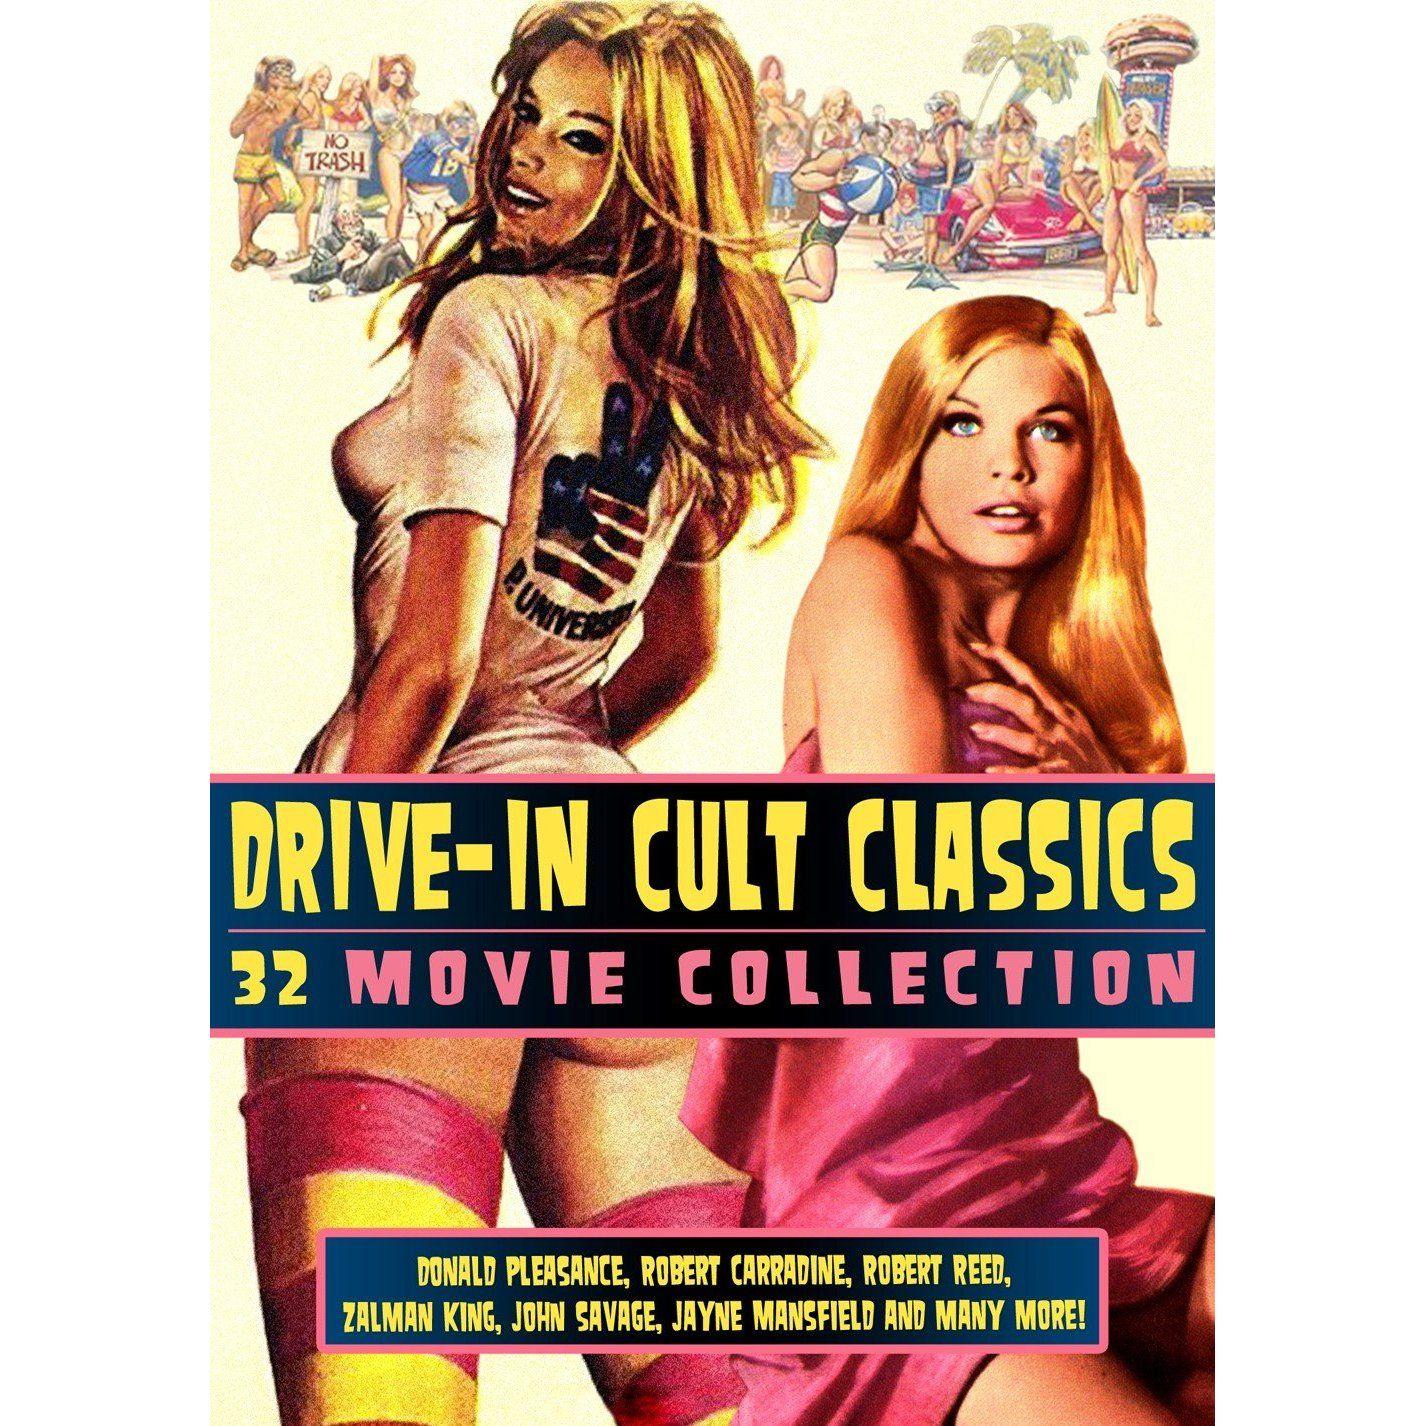 Drive-In cult classics